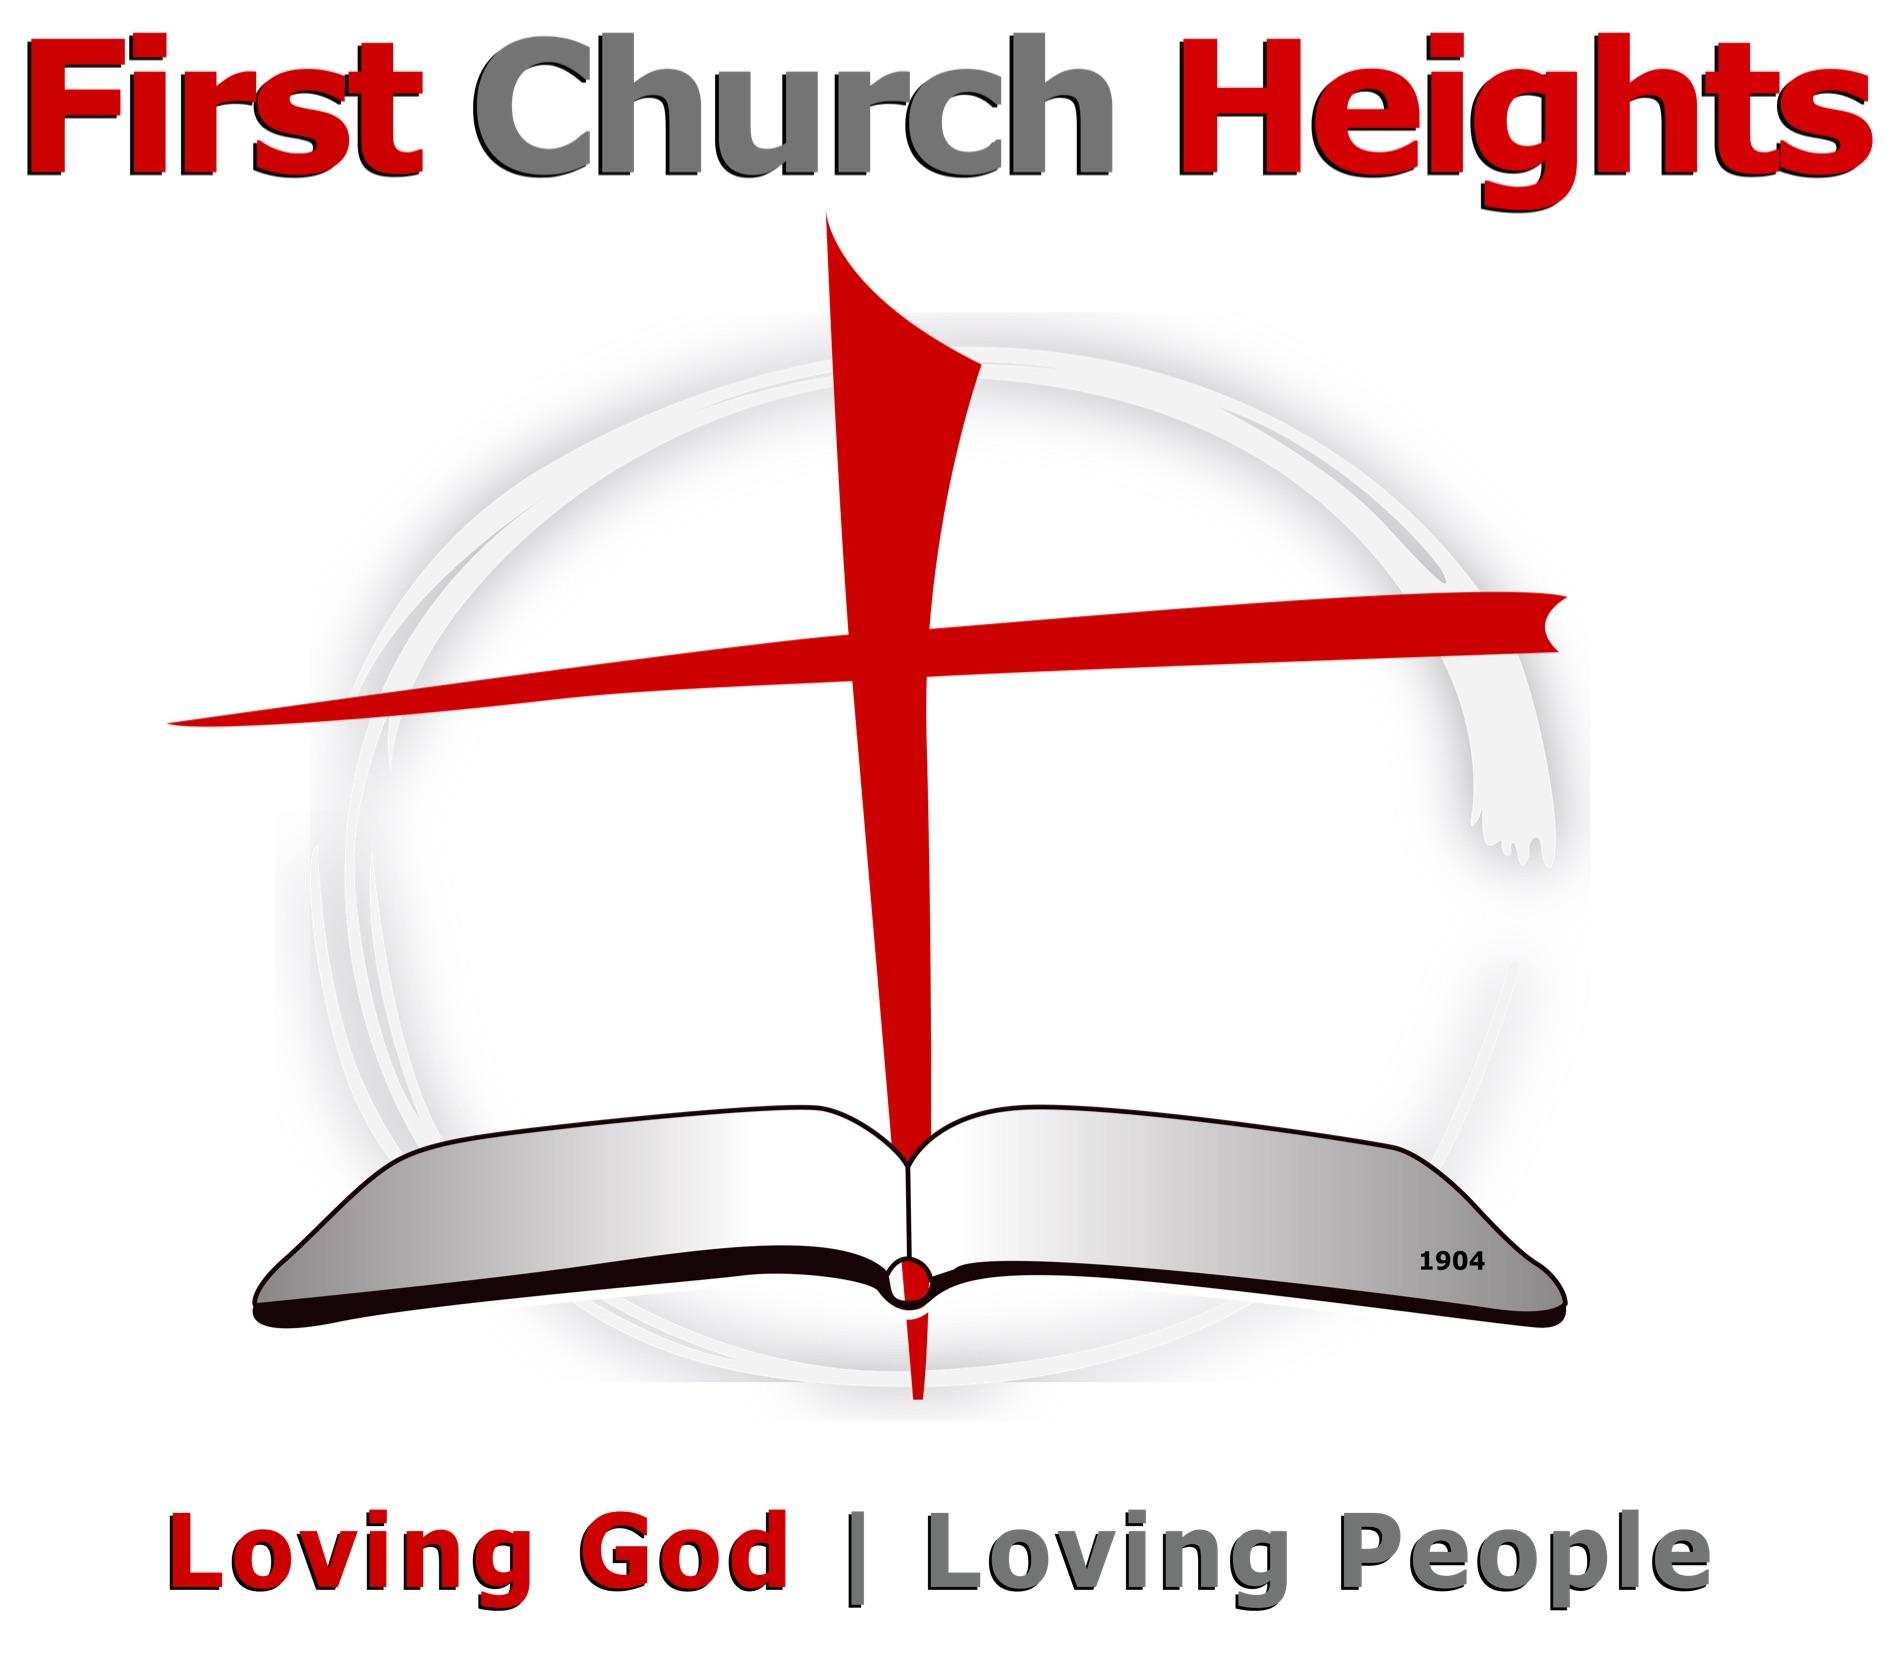 First Church Heights